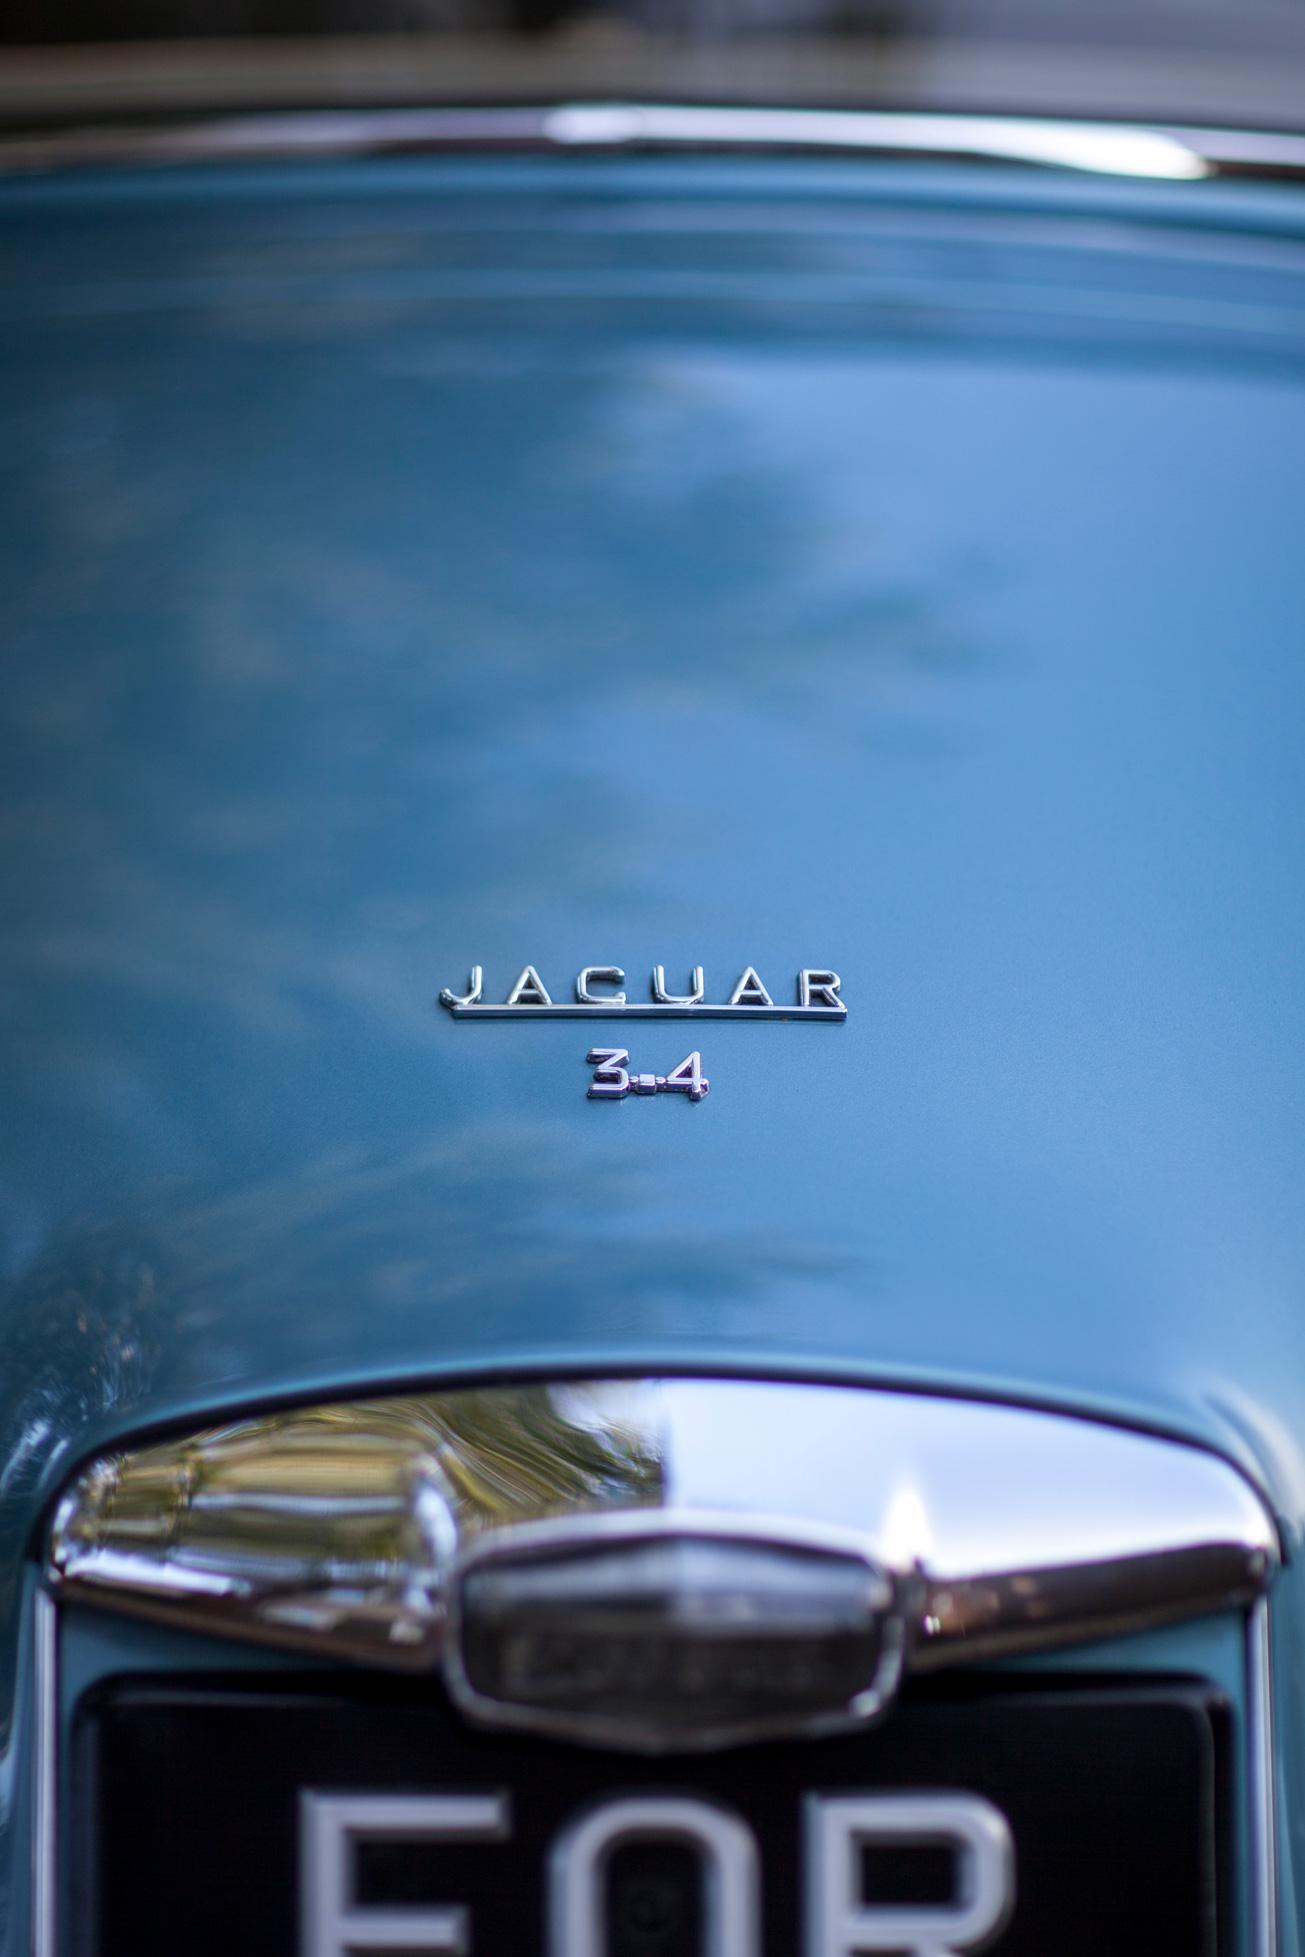 Jaguar, wedding car, blue wedding car, vintage car,